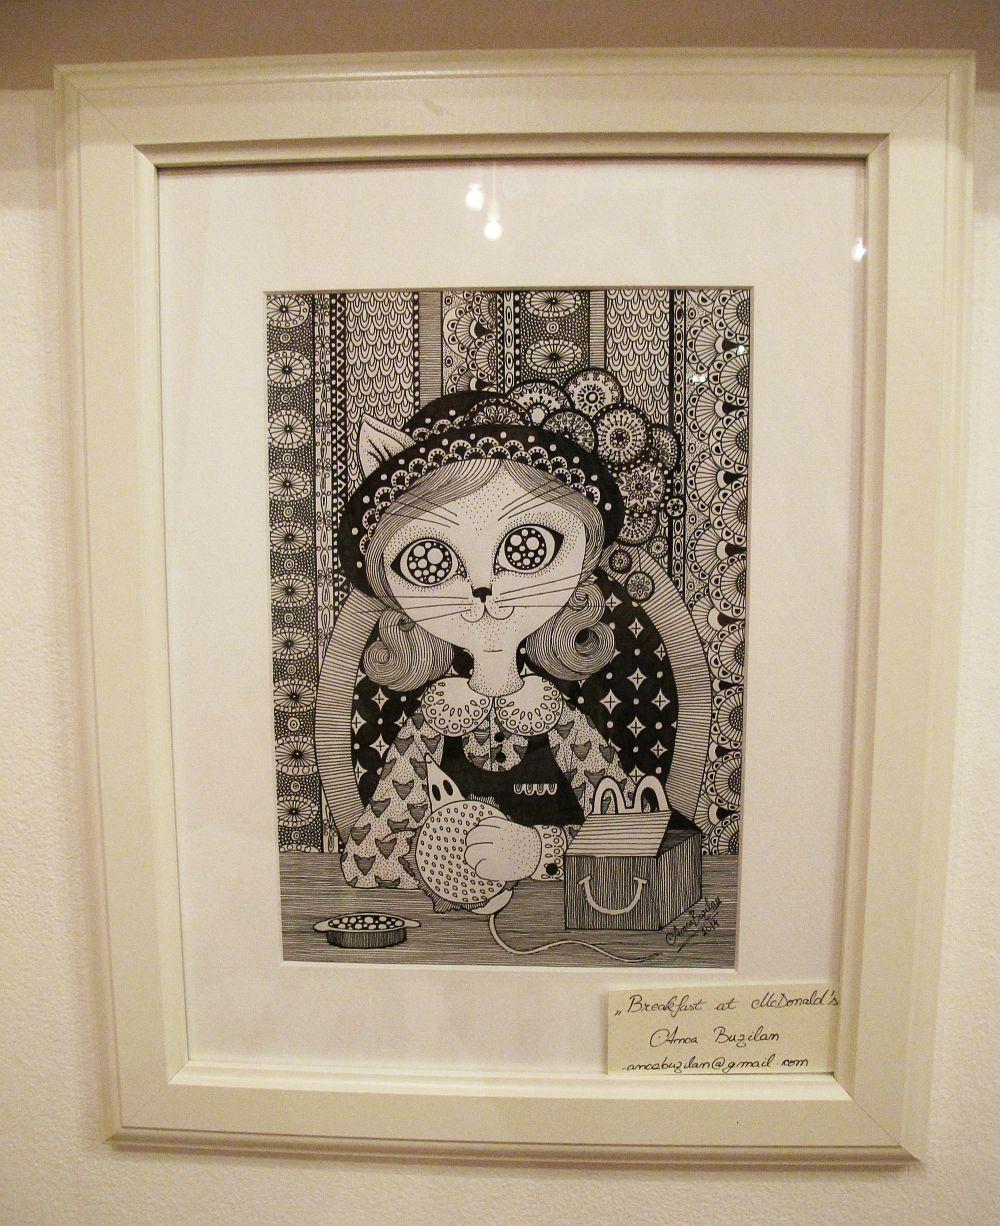 adelaparvu.com despre O povEstetica, expozitie la Pallets, artisti Alina Borcea si Anca Buzilan (12)